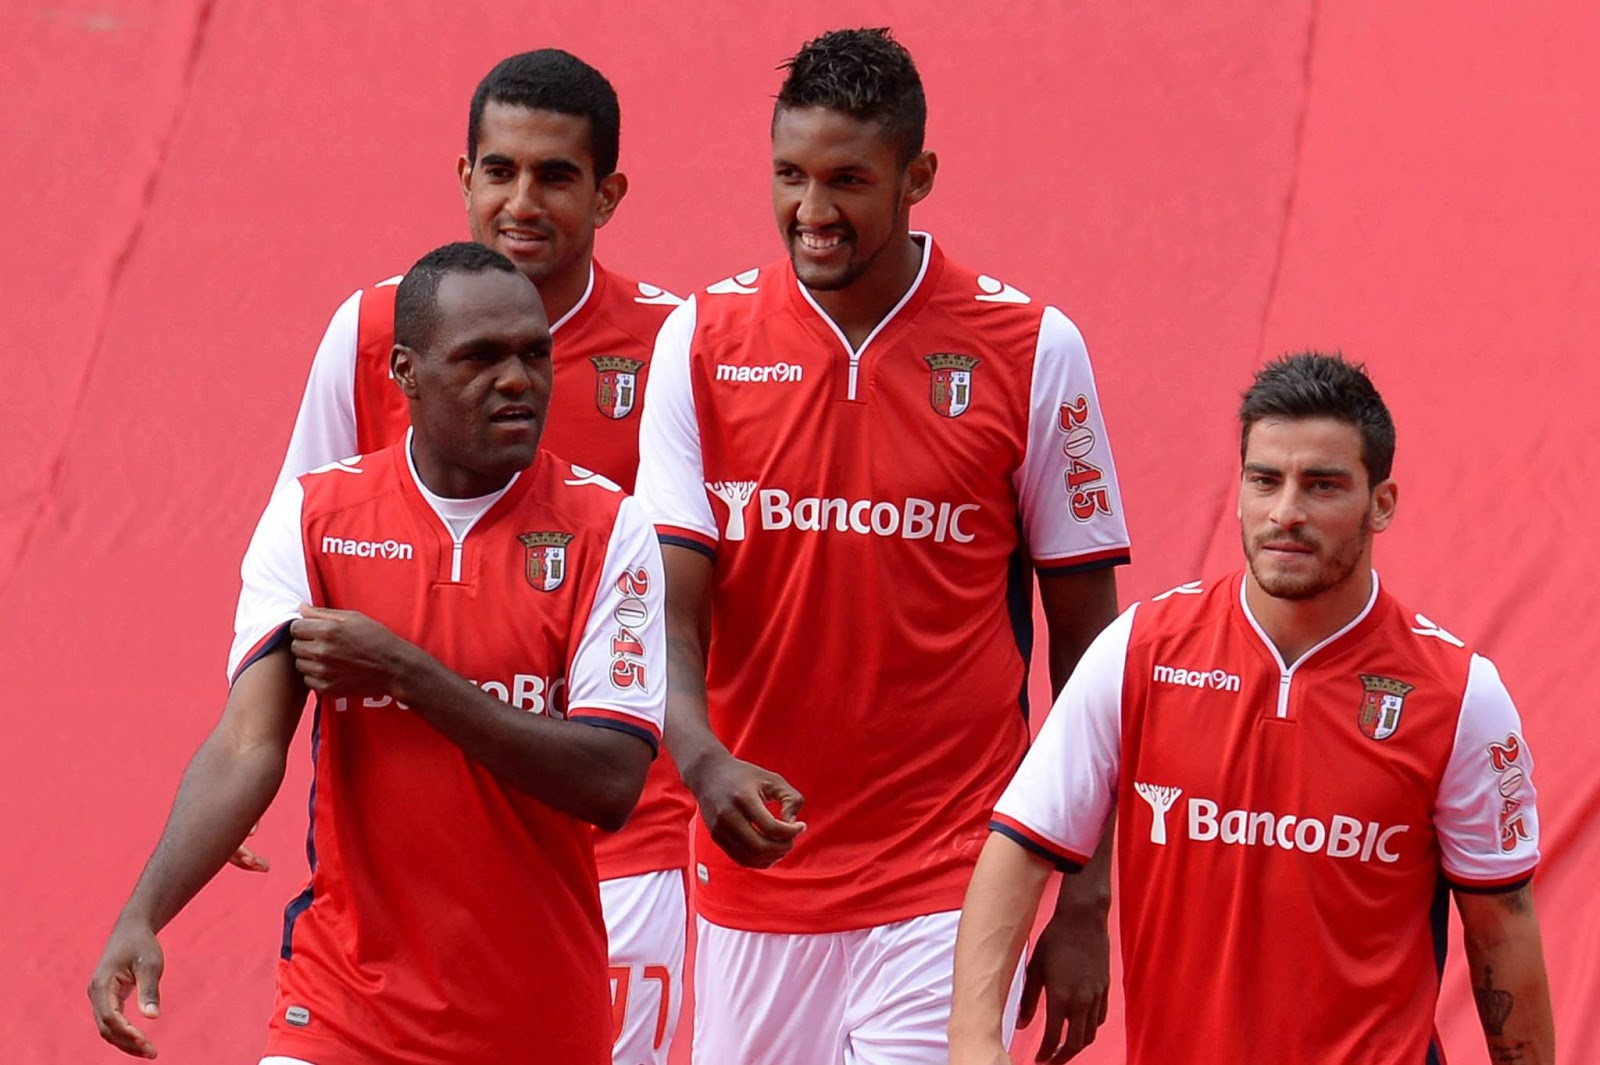 SC Braga: Braga 14-15 Home And Away Kits Released